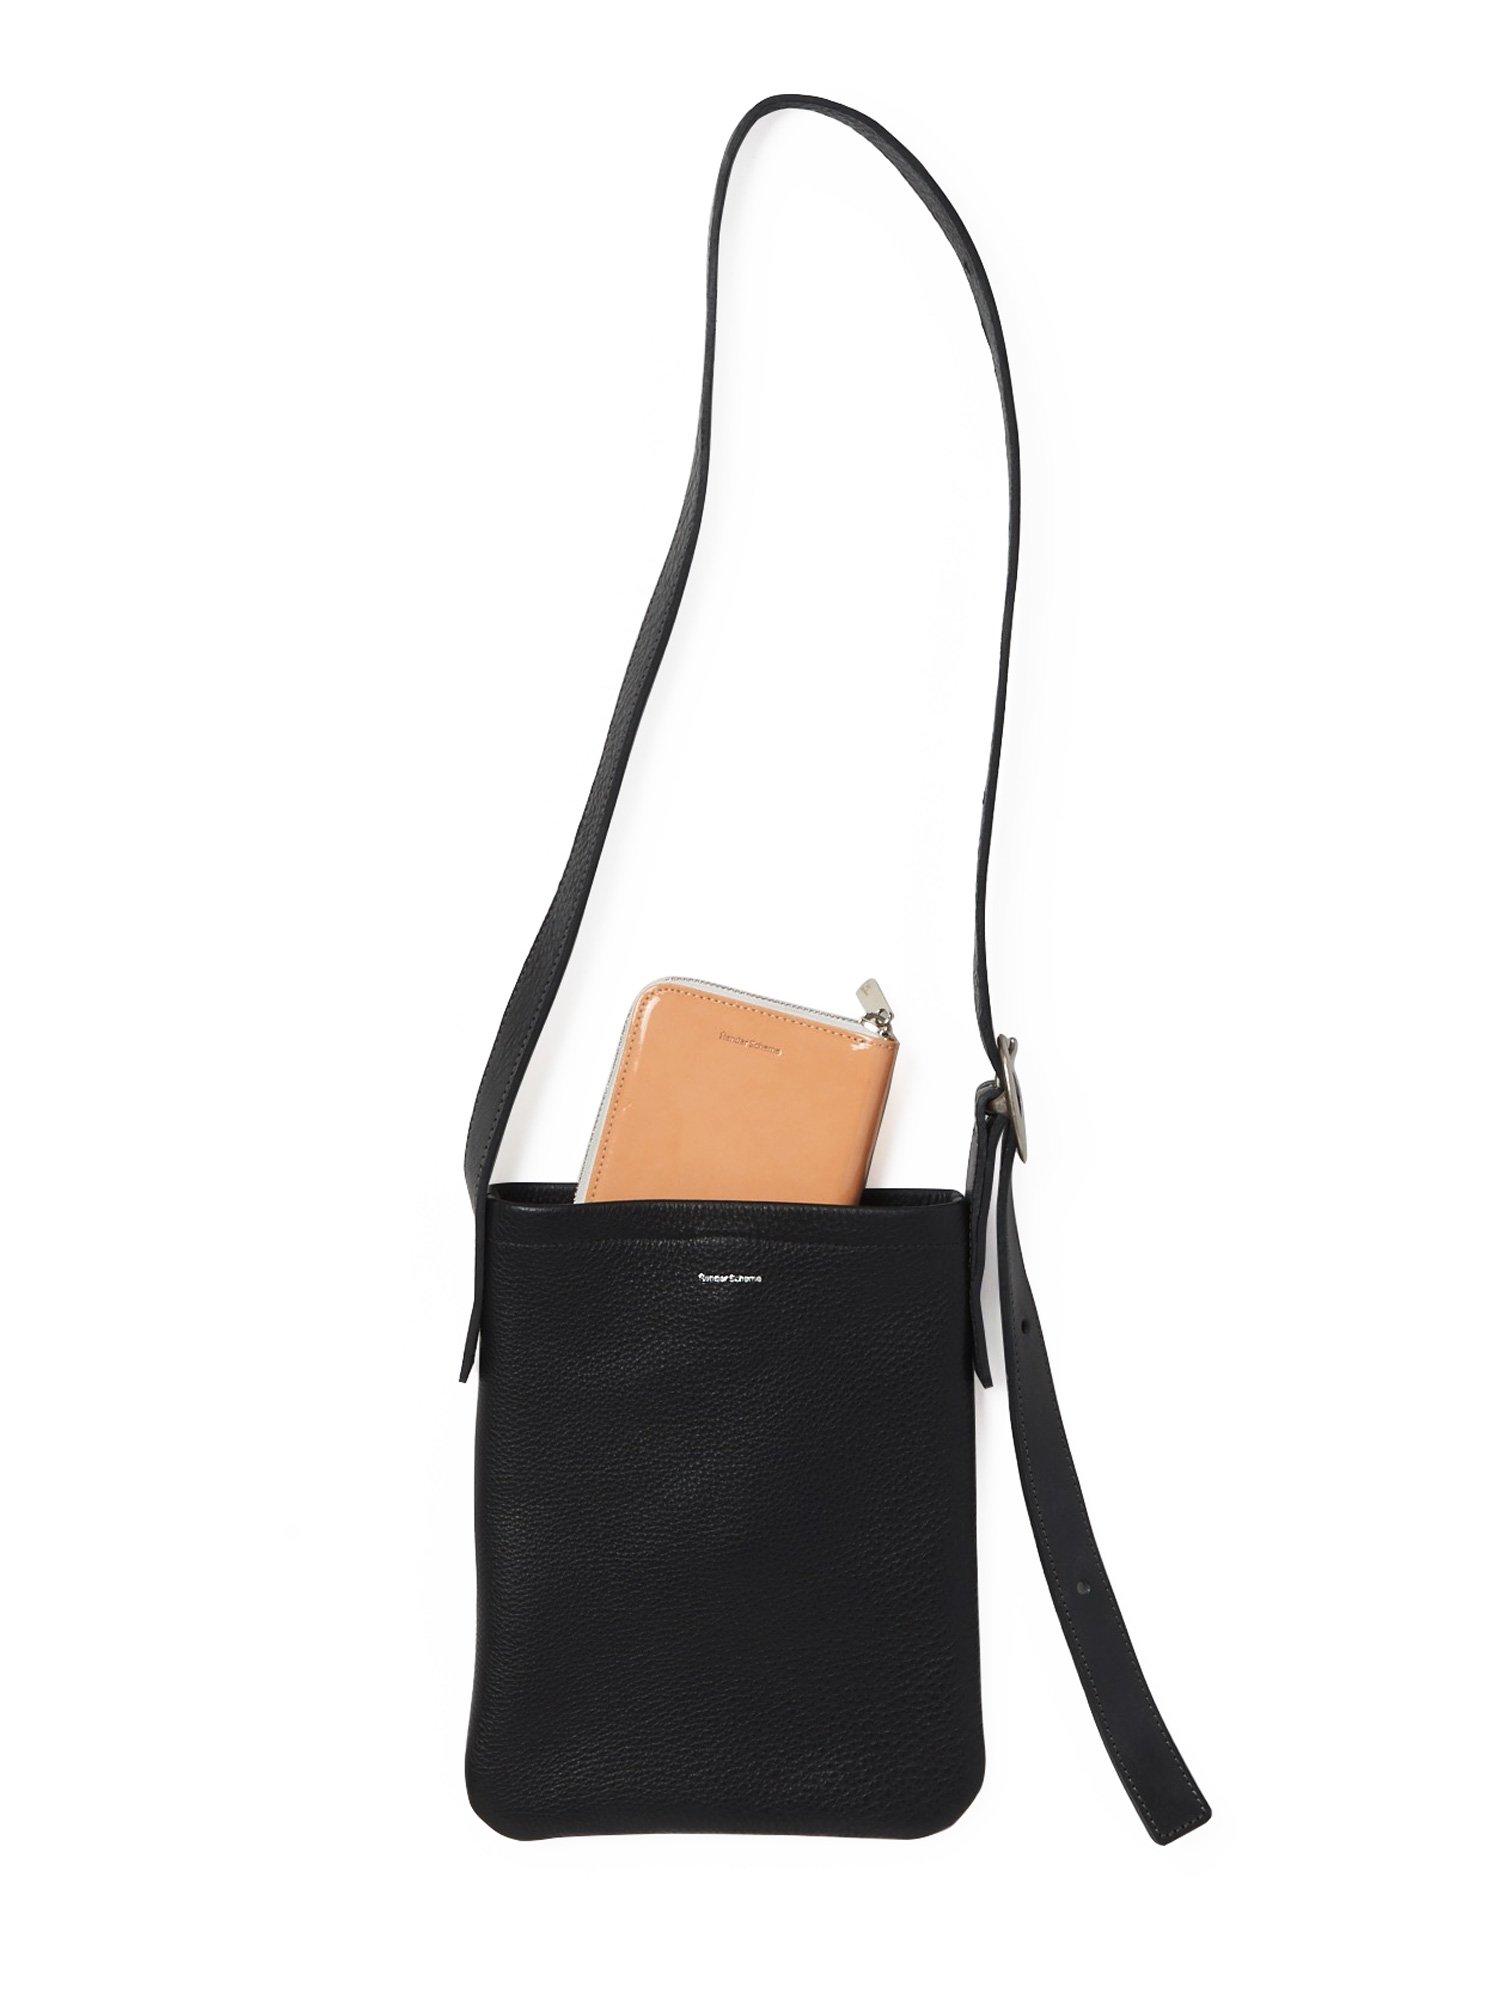 【Hender Scheme】ONE SIDE BELT BAG SMALL (BLACK)_1